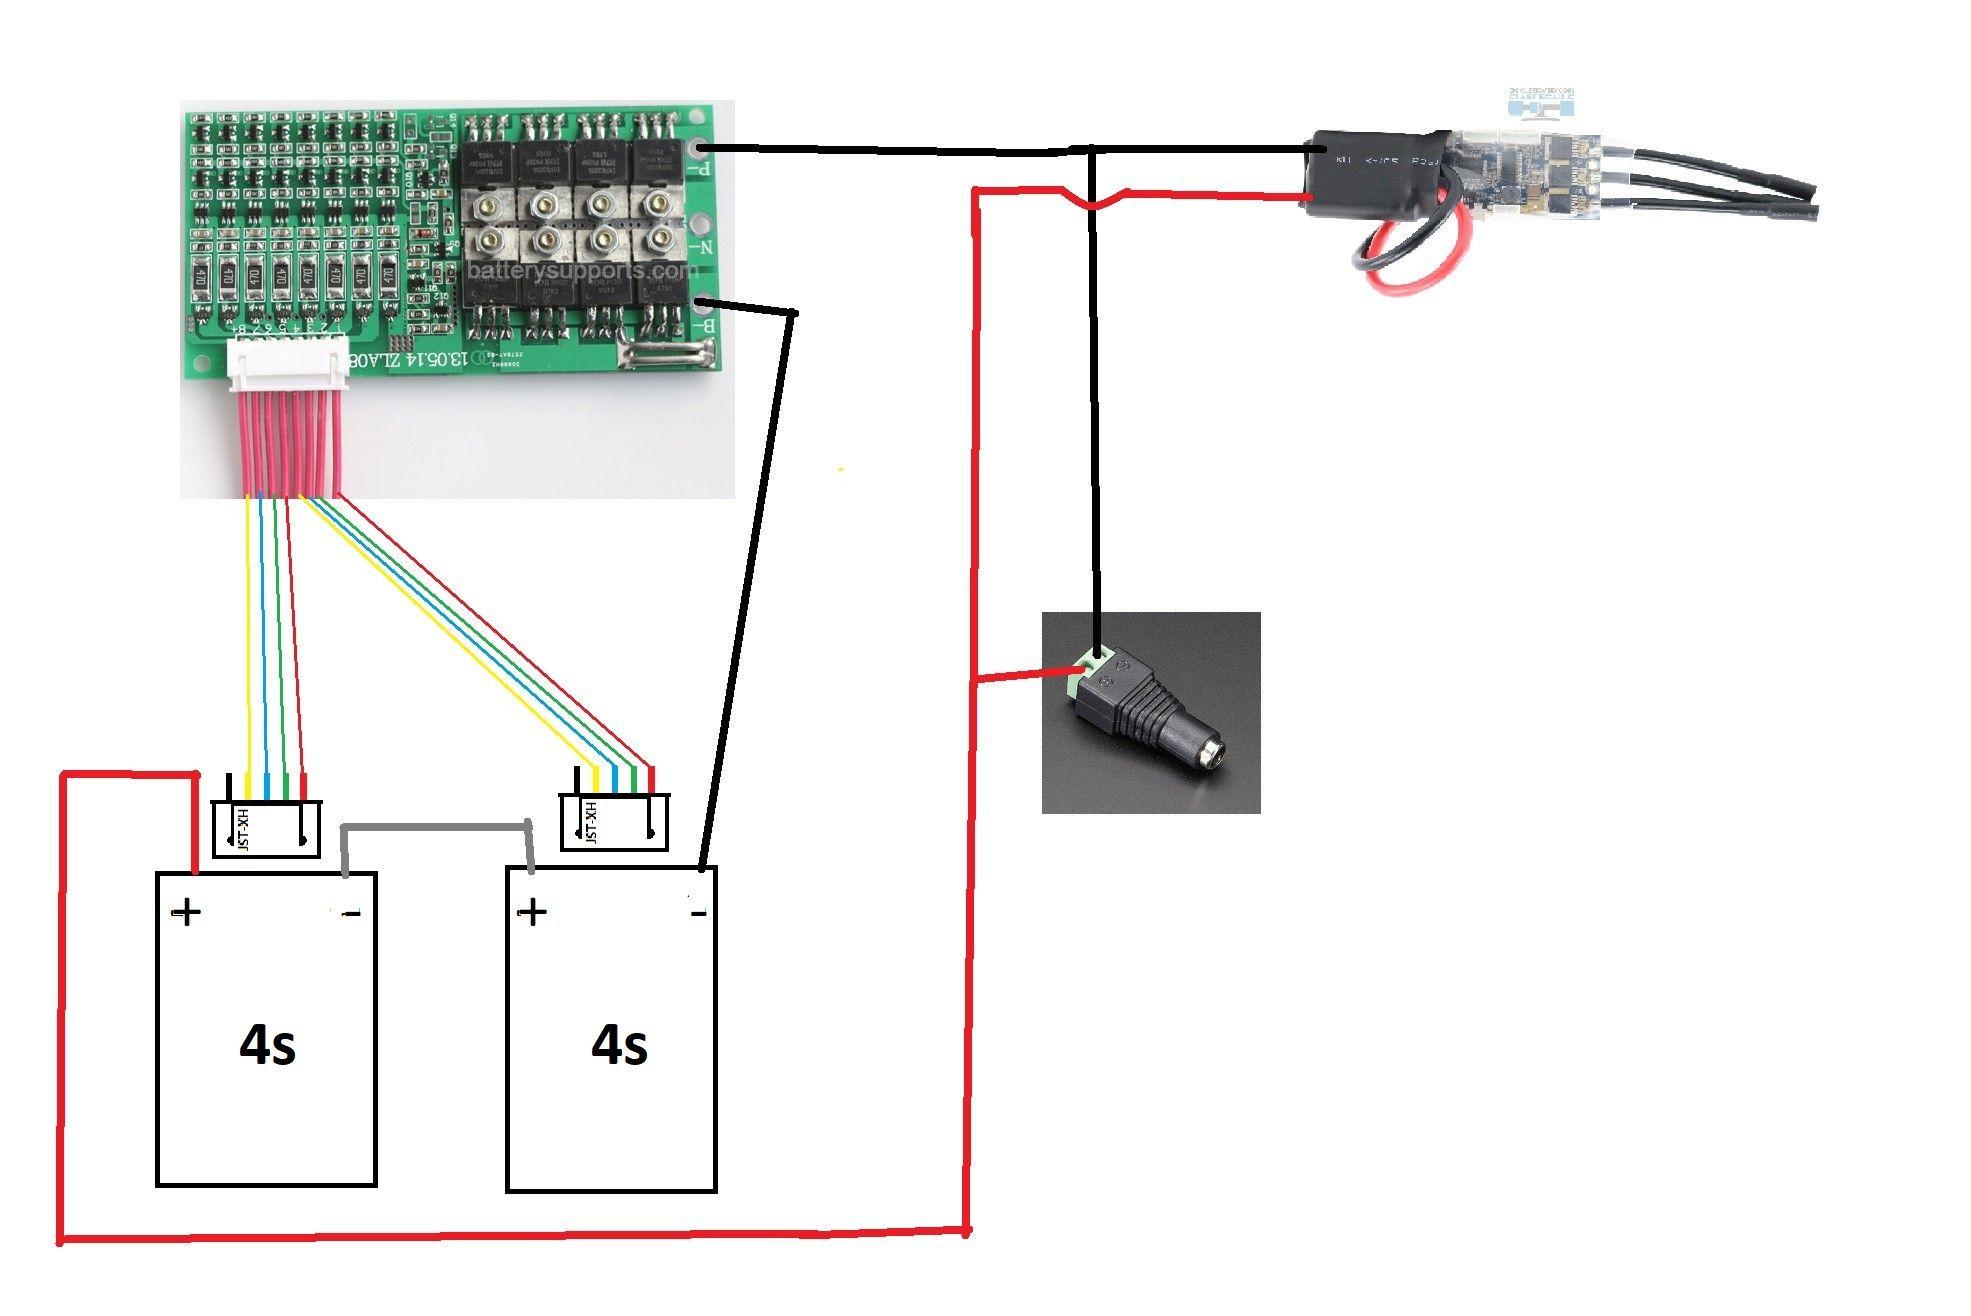 Bms Wiring Diagram Elegant In 2020 Hvac System Electric Skateboard Fuse Box